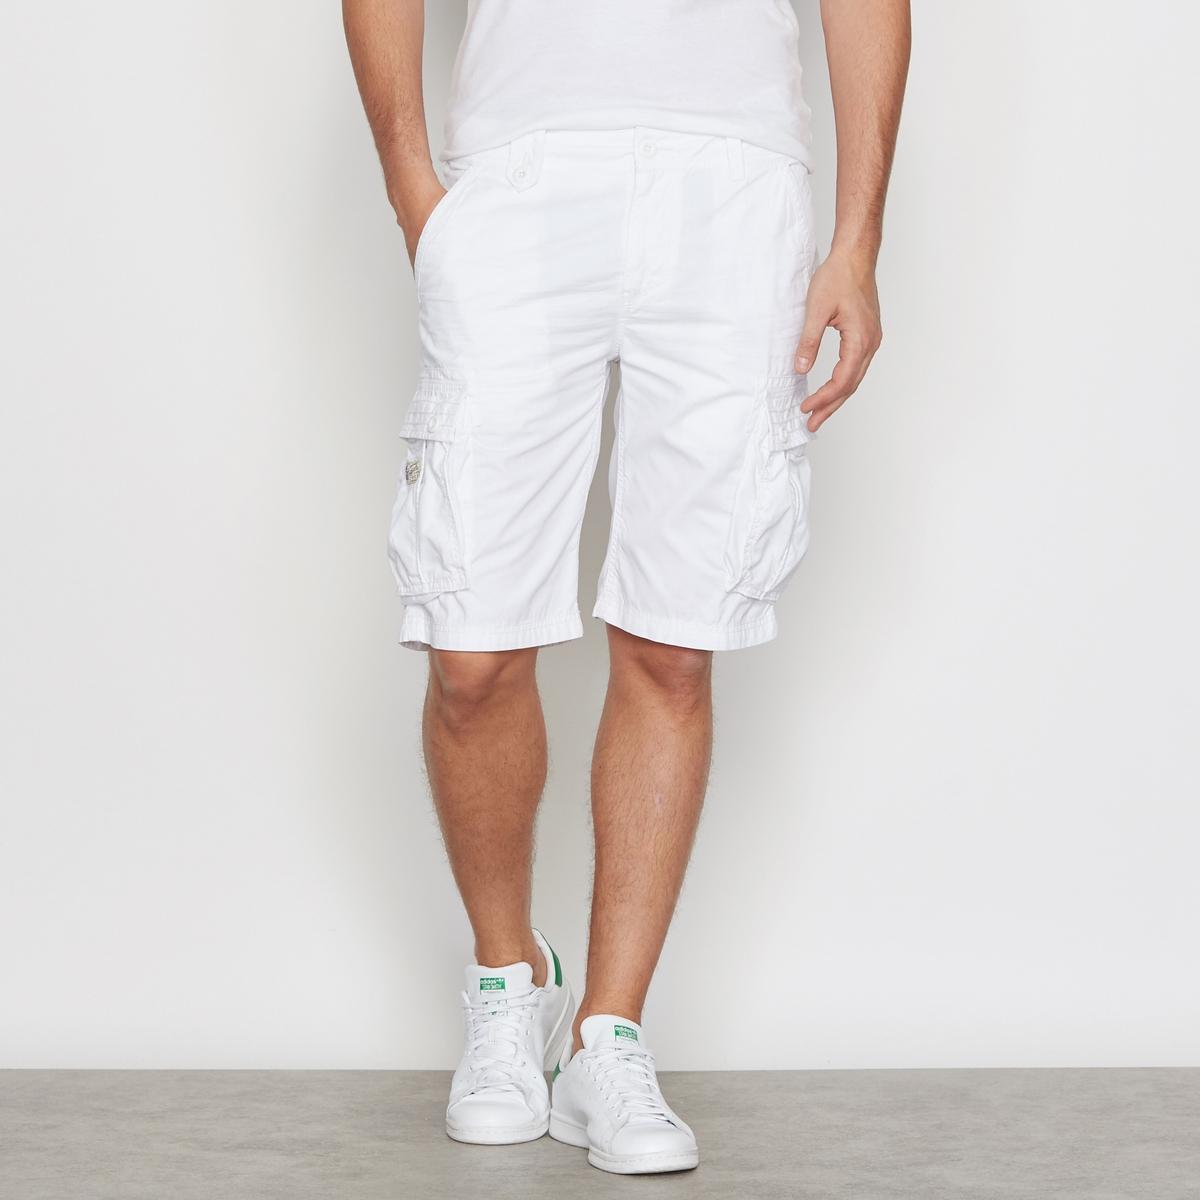 Бермуды в стиле милитари, 100% хлопка, KORGE в минске рубашку милитари